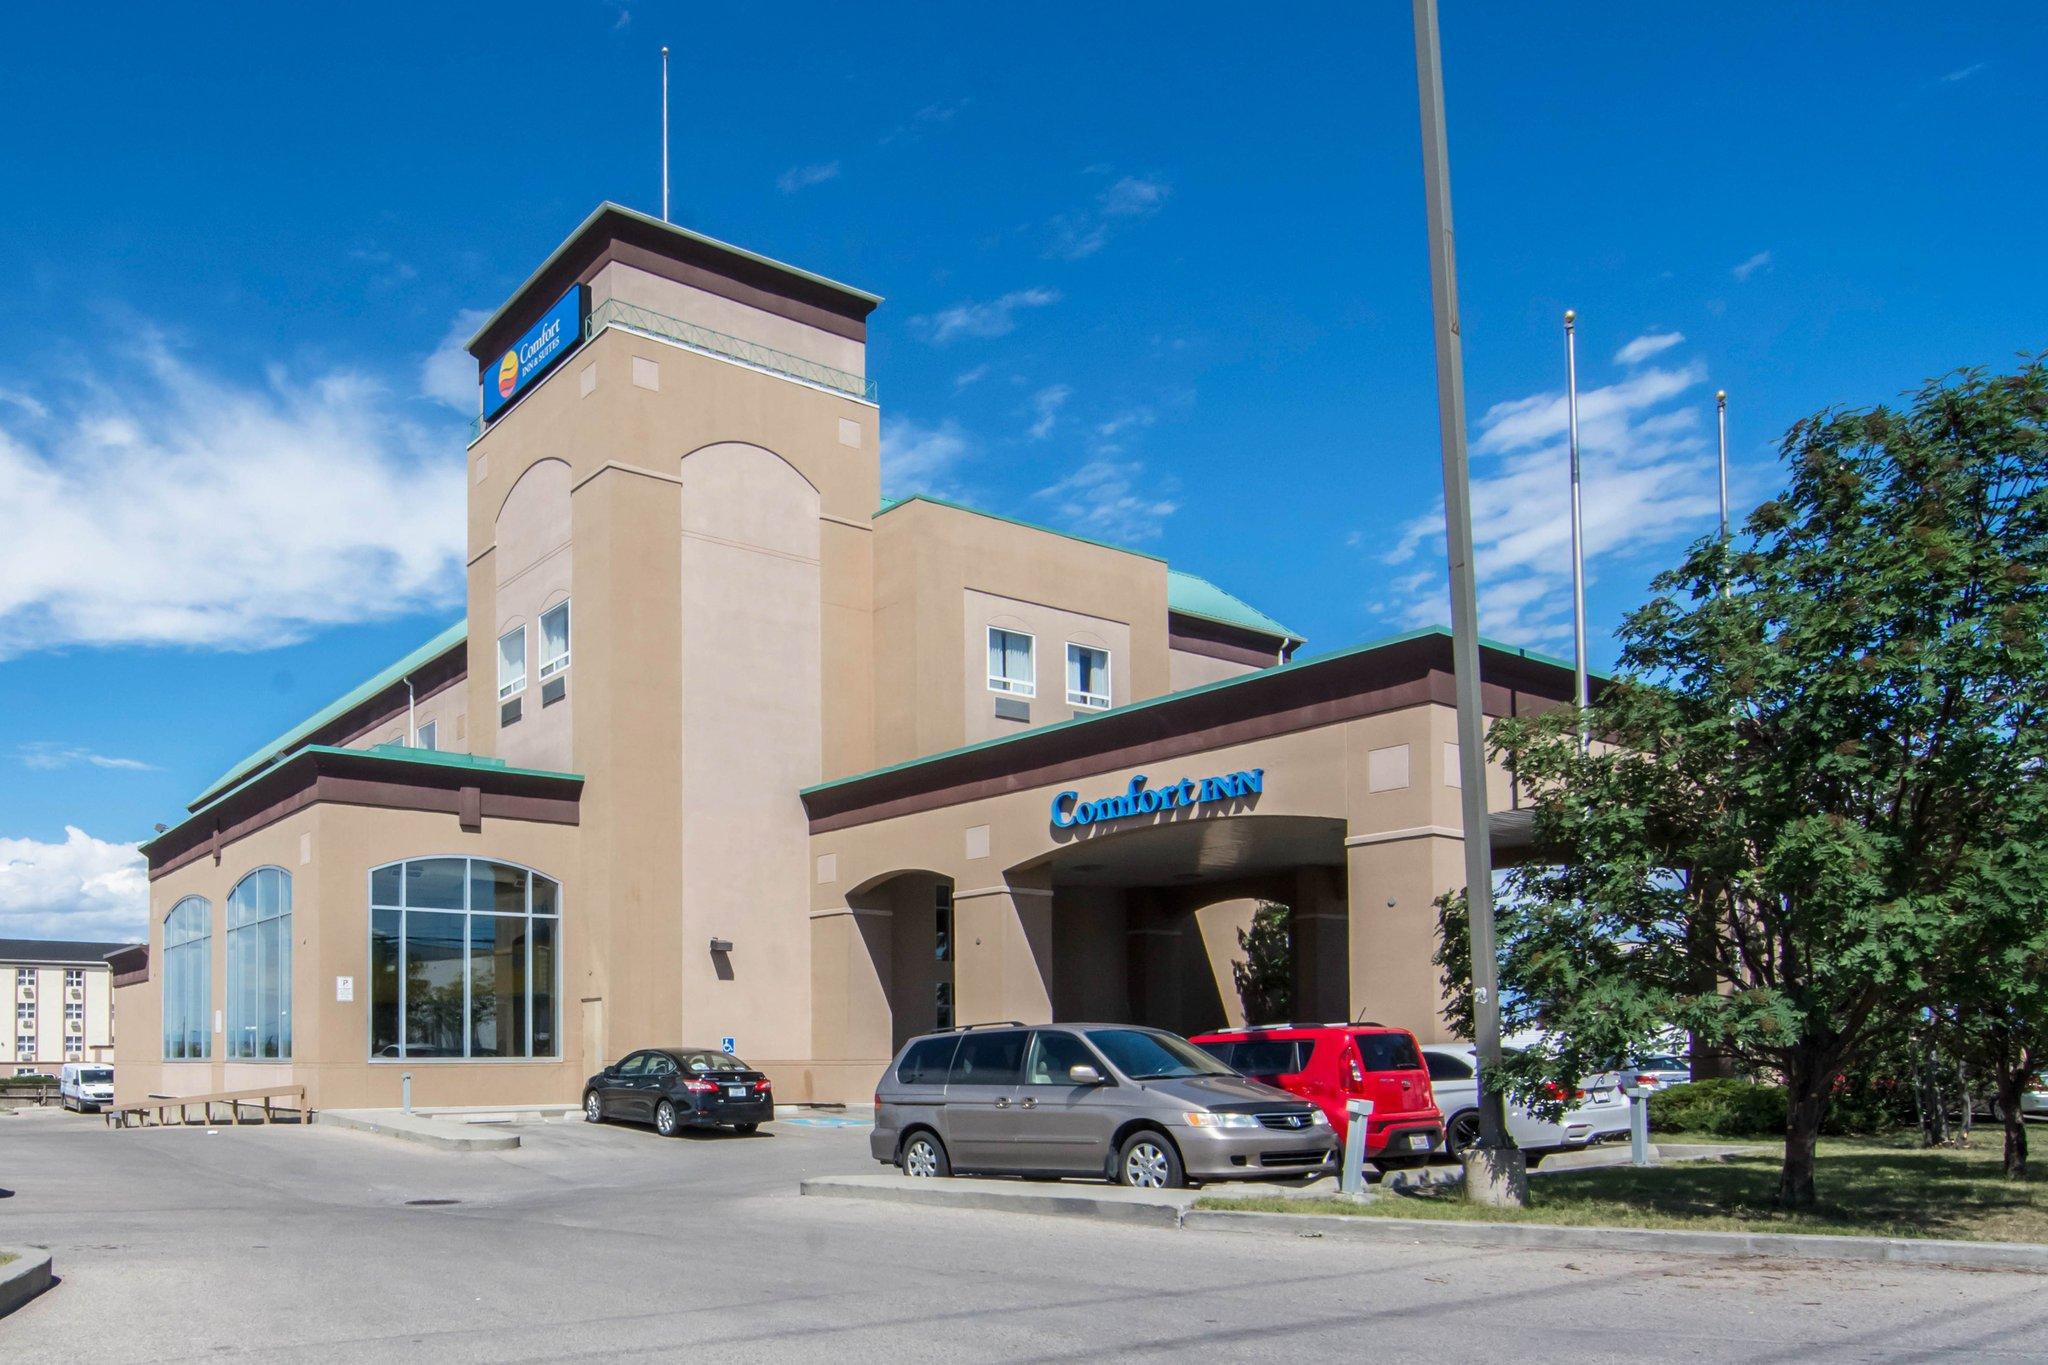 Comfort Inn Amp Suites Calgary Airport Updated 2017 Hotel Reviews Amp Price Comparison Canada